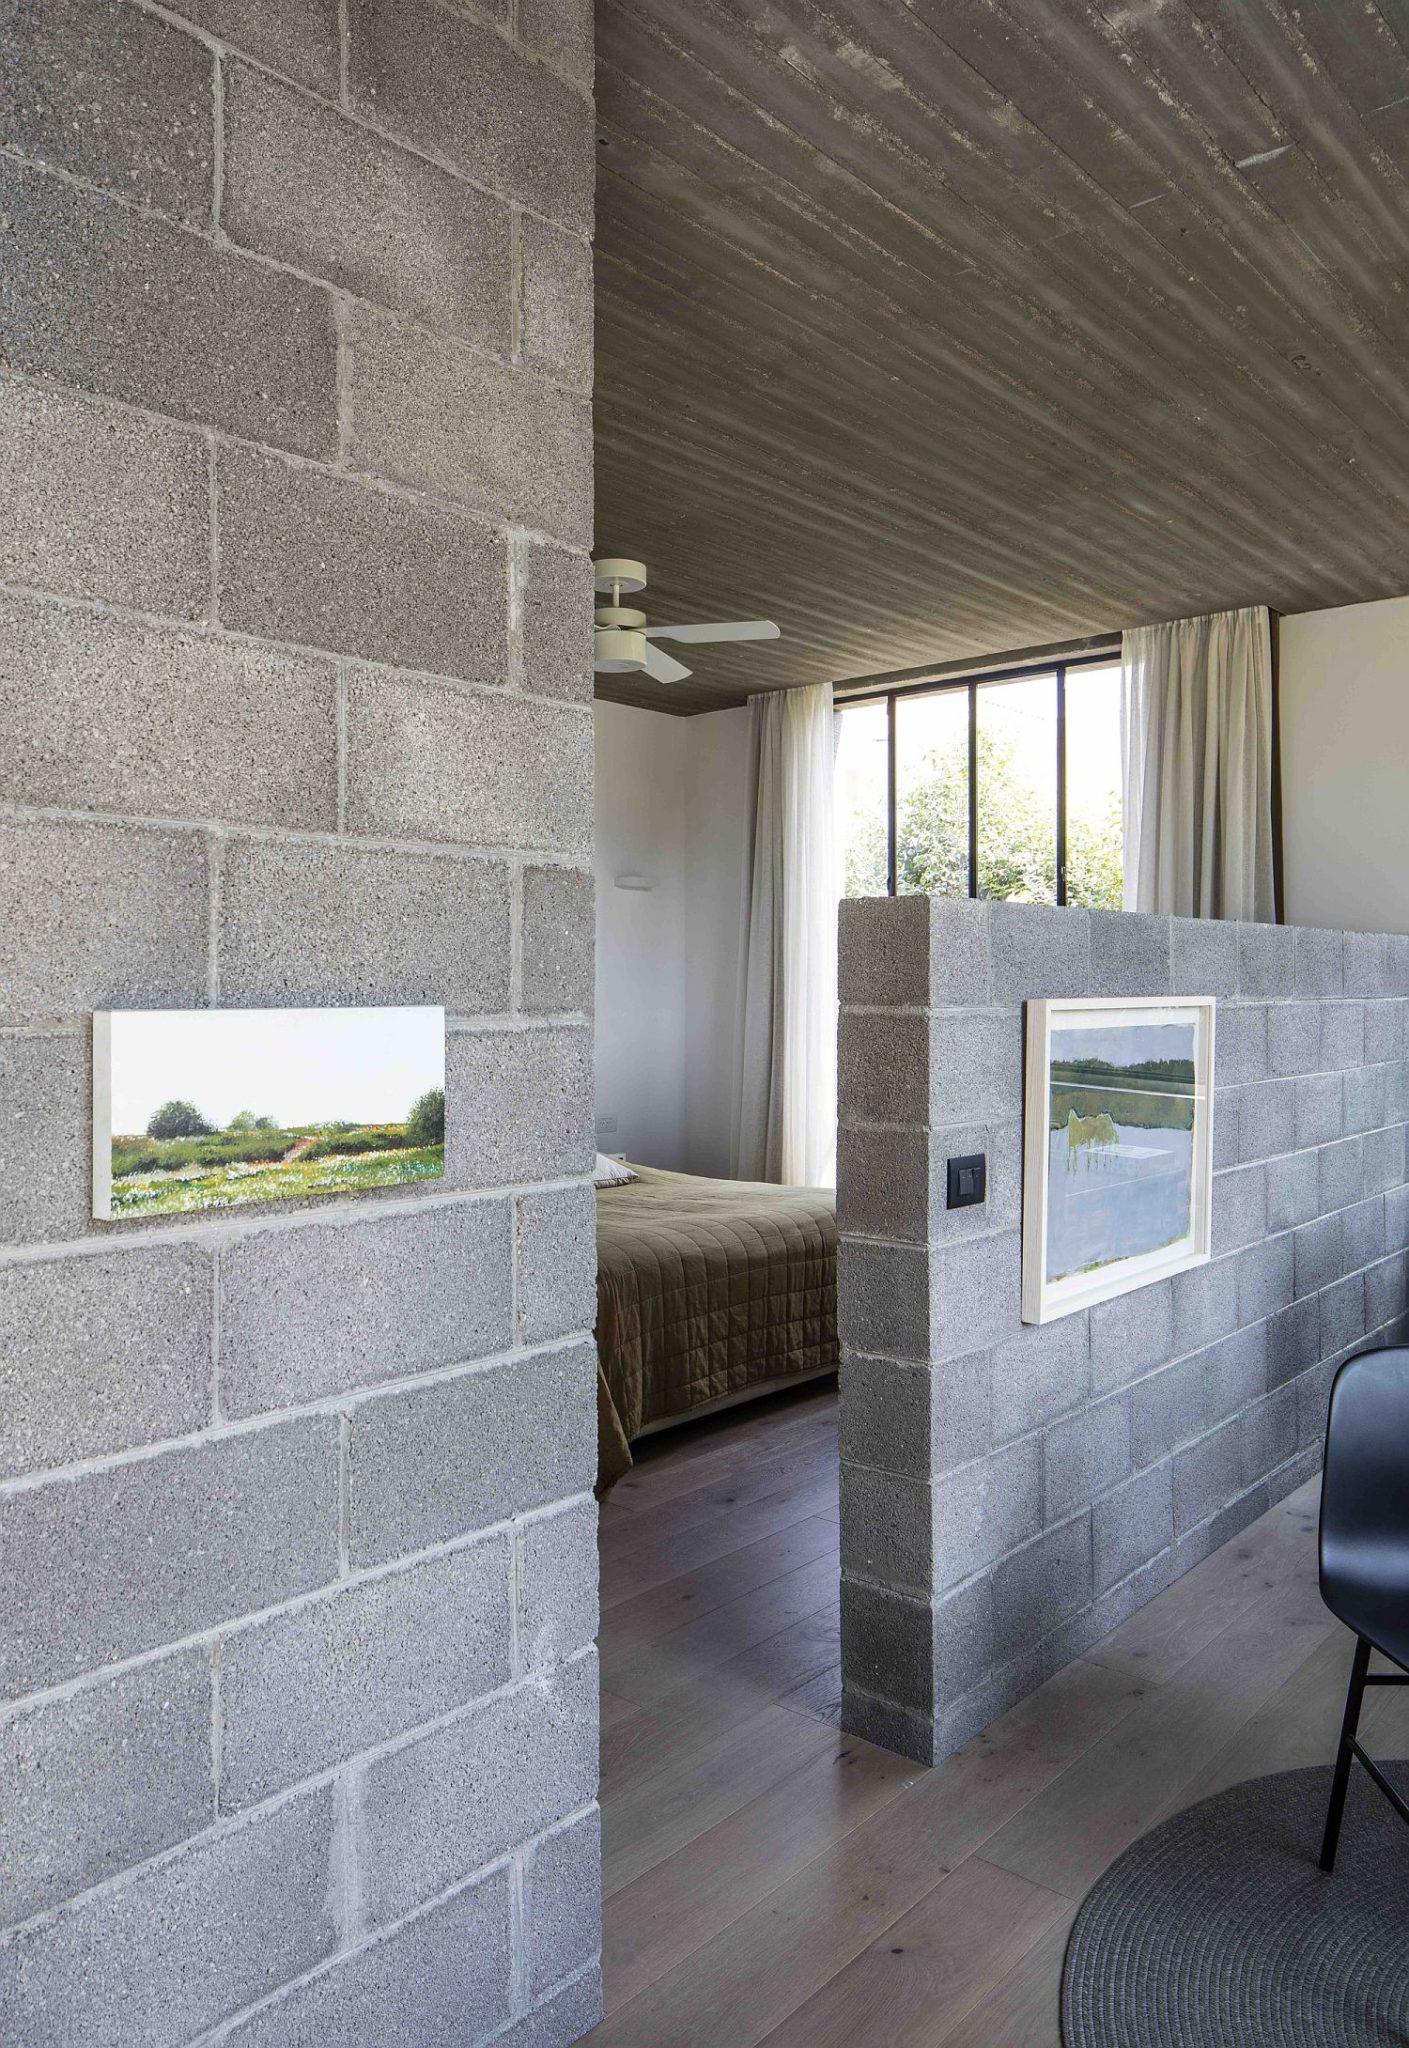 Bedroom Layout With Vanity